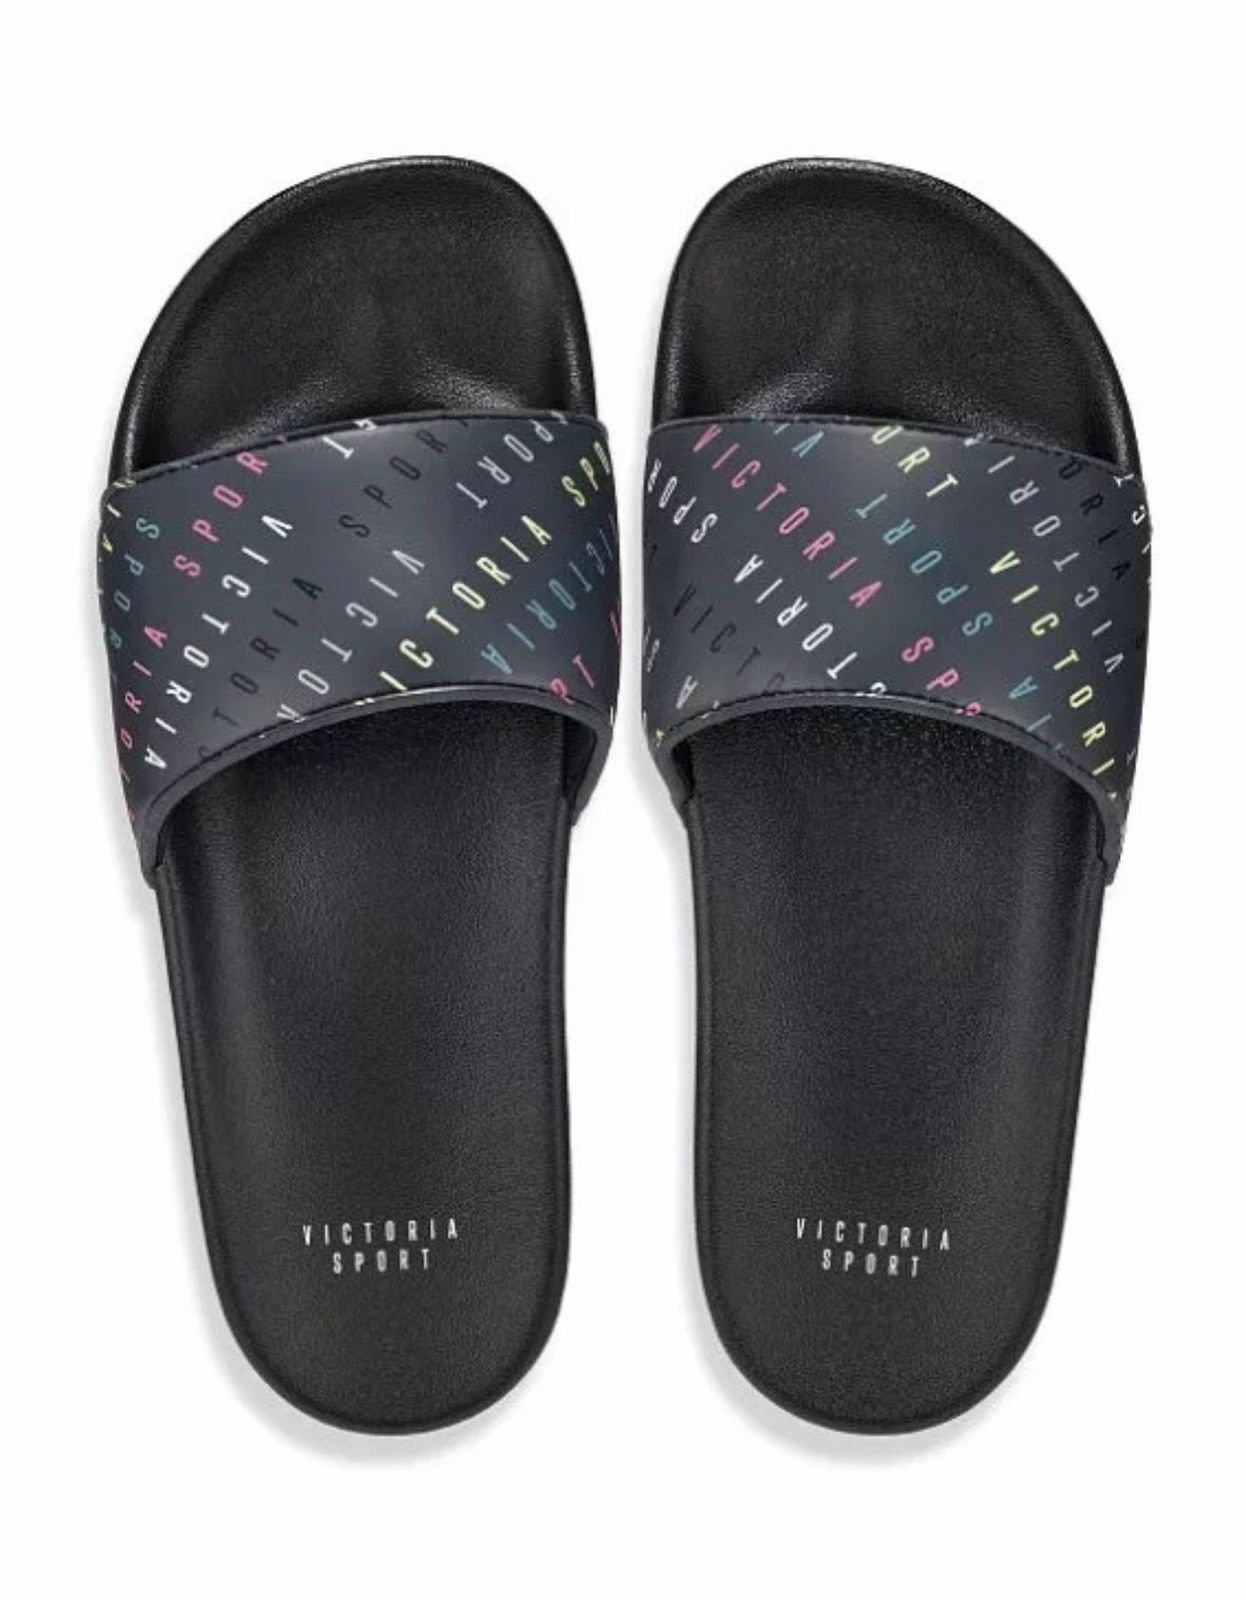 NIP Victoria's Secret Sport Black Multi LIMITED Logo Slides Size Medium LIMITED Multi EDITION 3a6e1e